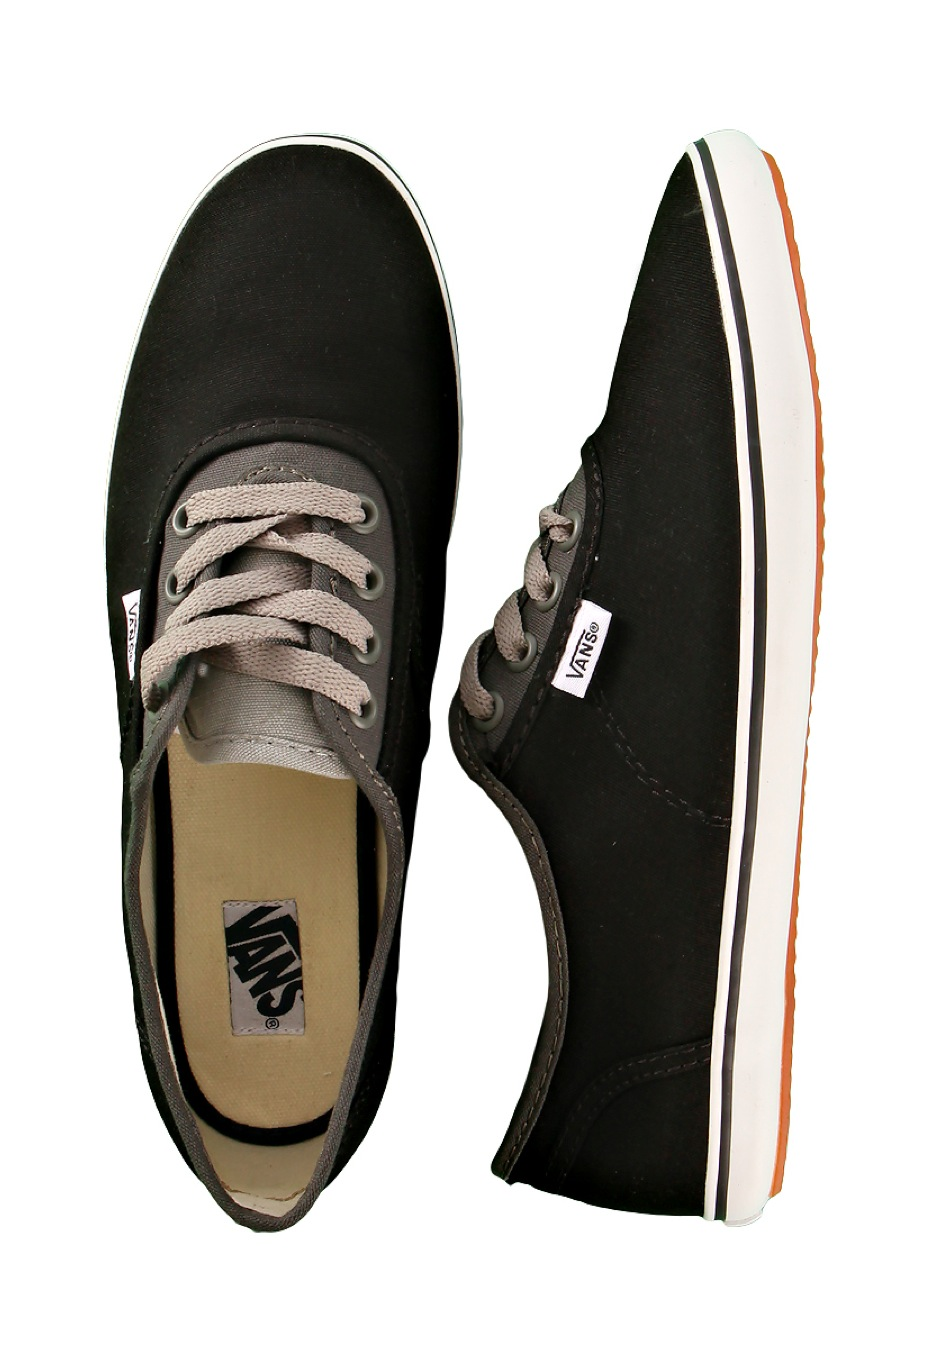 72d2c1d0b85b02 Vans - Cedar Tri-Tone - Girl Shoes - Impericon.com UK